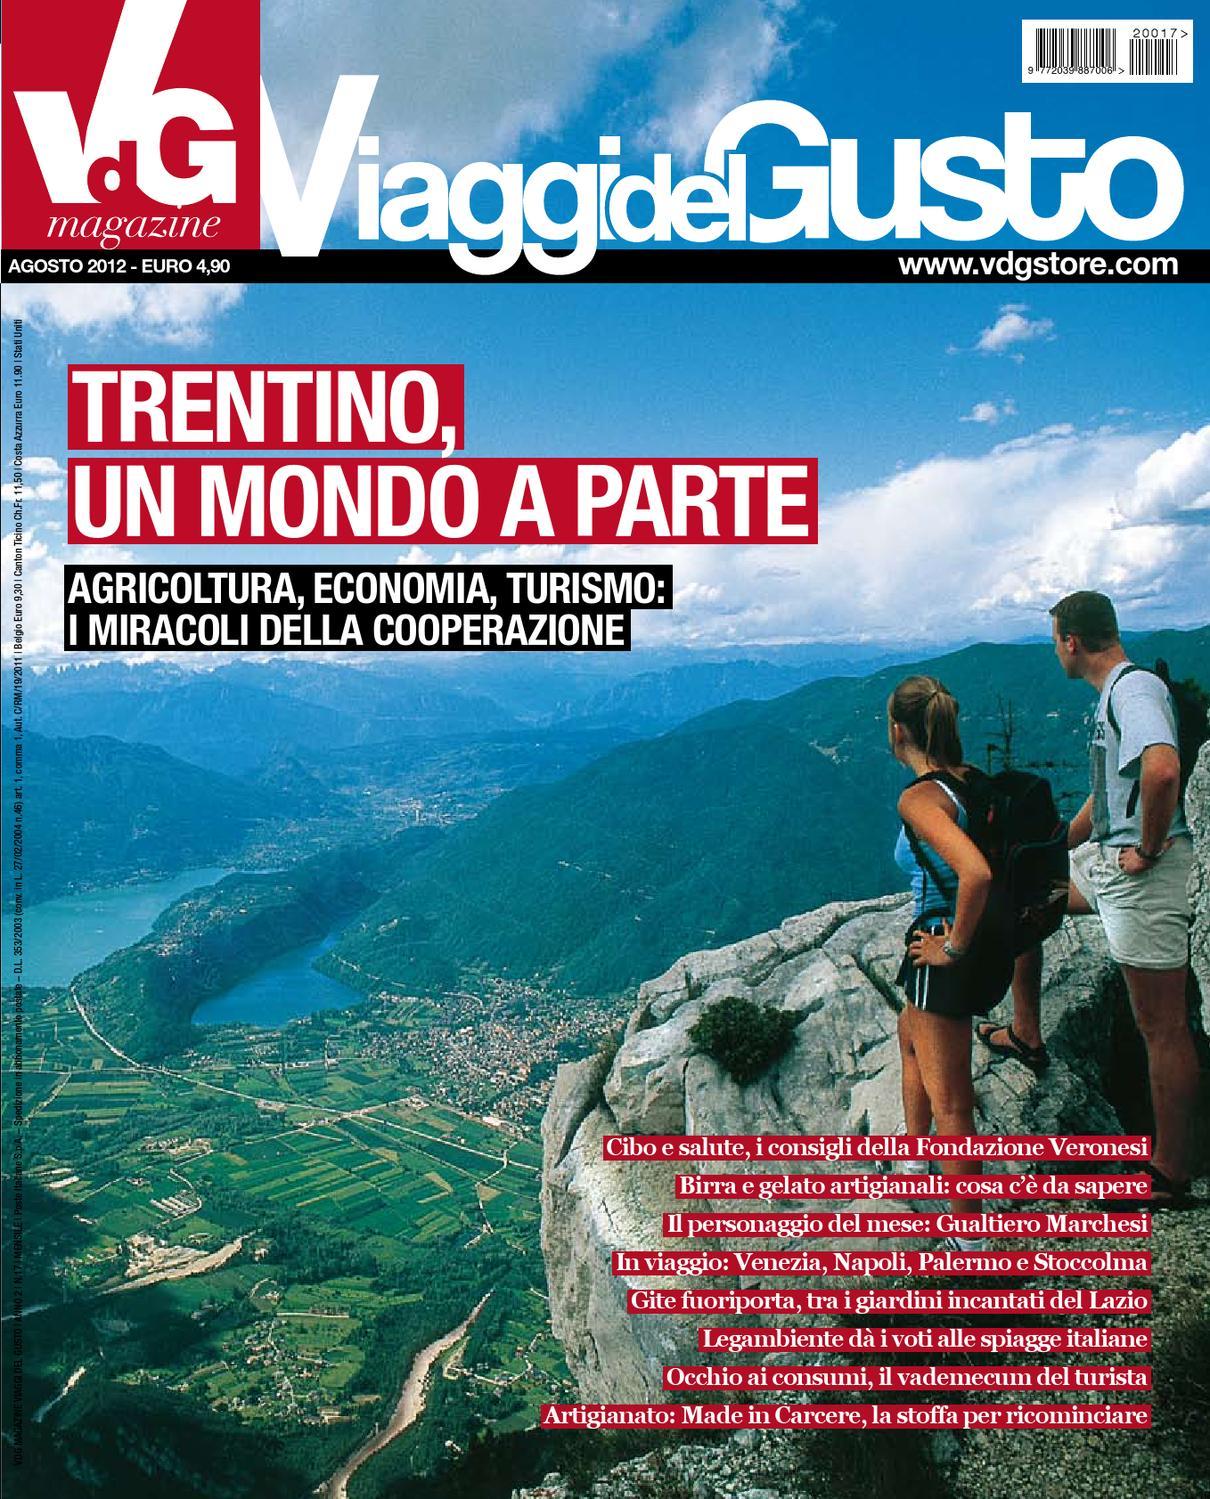 VdG Magazine Viaggi del gusto by vdgmagazine - issuu 07476032709e